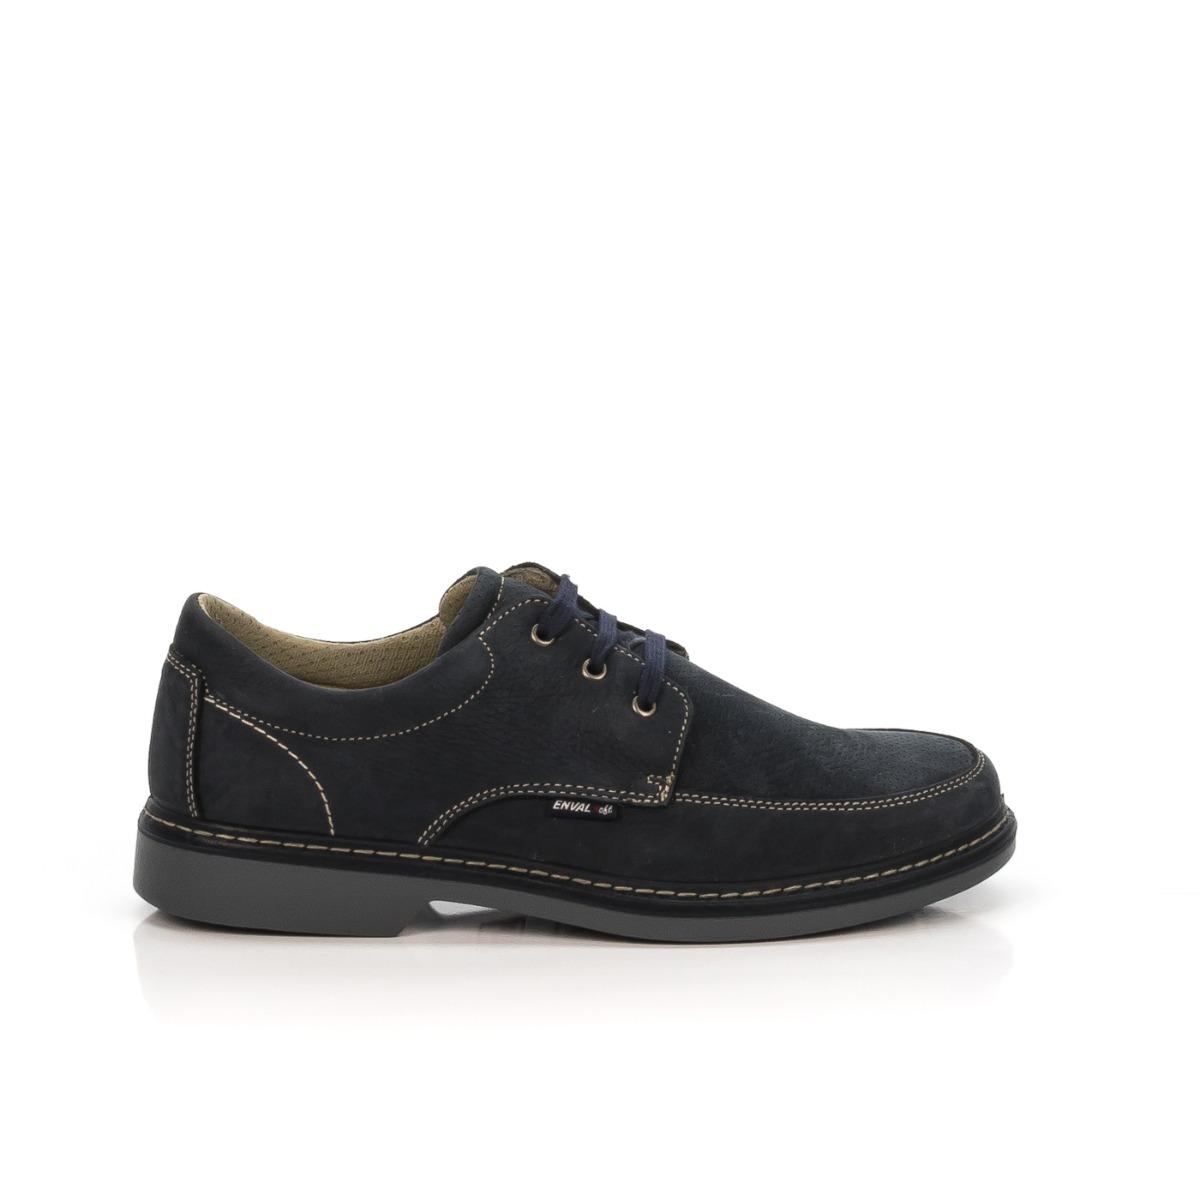 Soft Uomo Enval 12028 Stringata Blu Shoecenter Nabuk Neri Pelle fyvb76gmIY